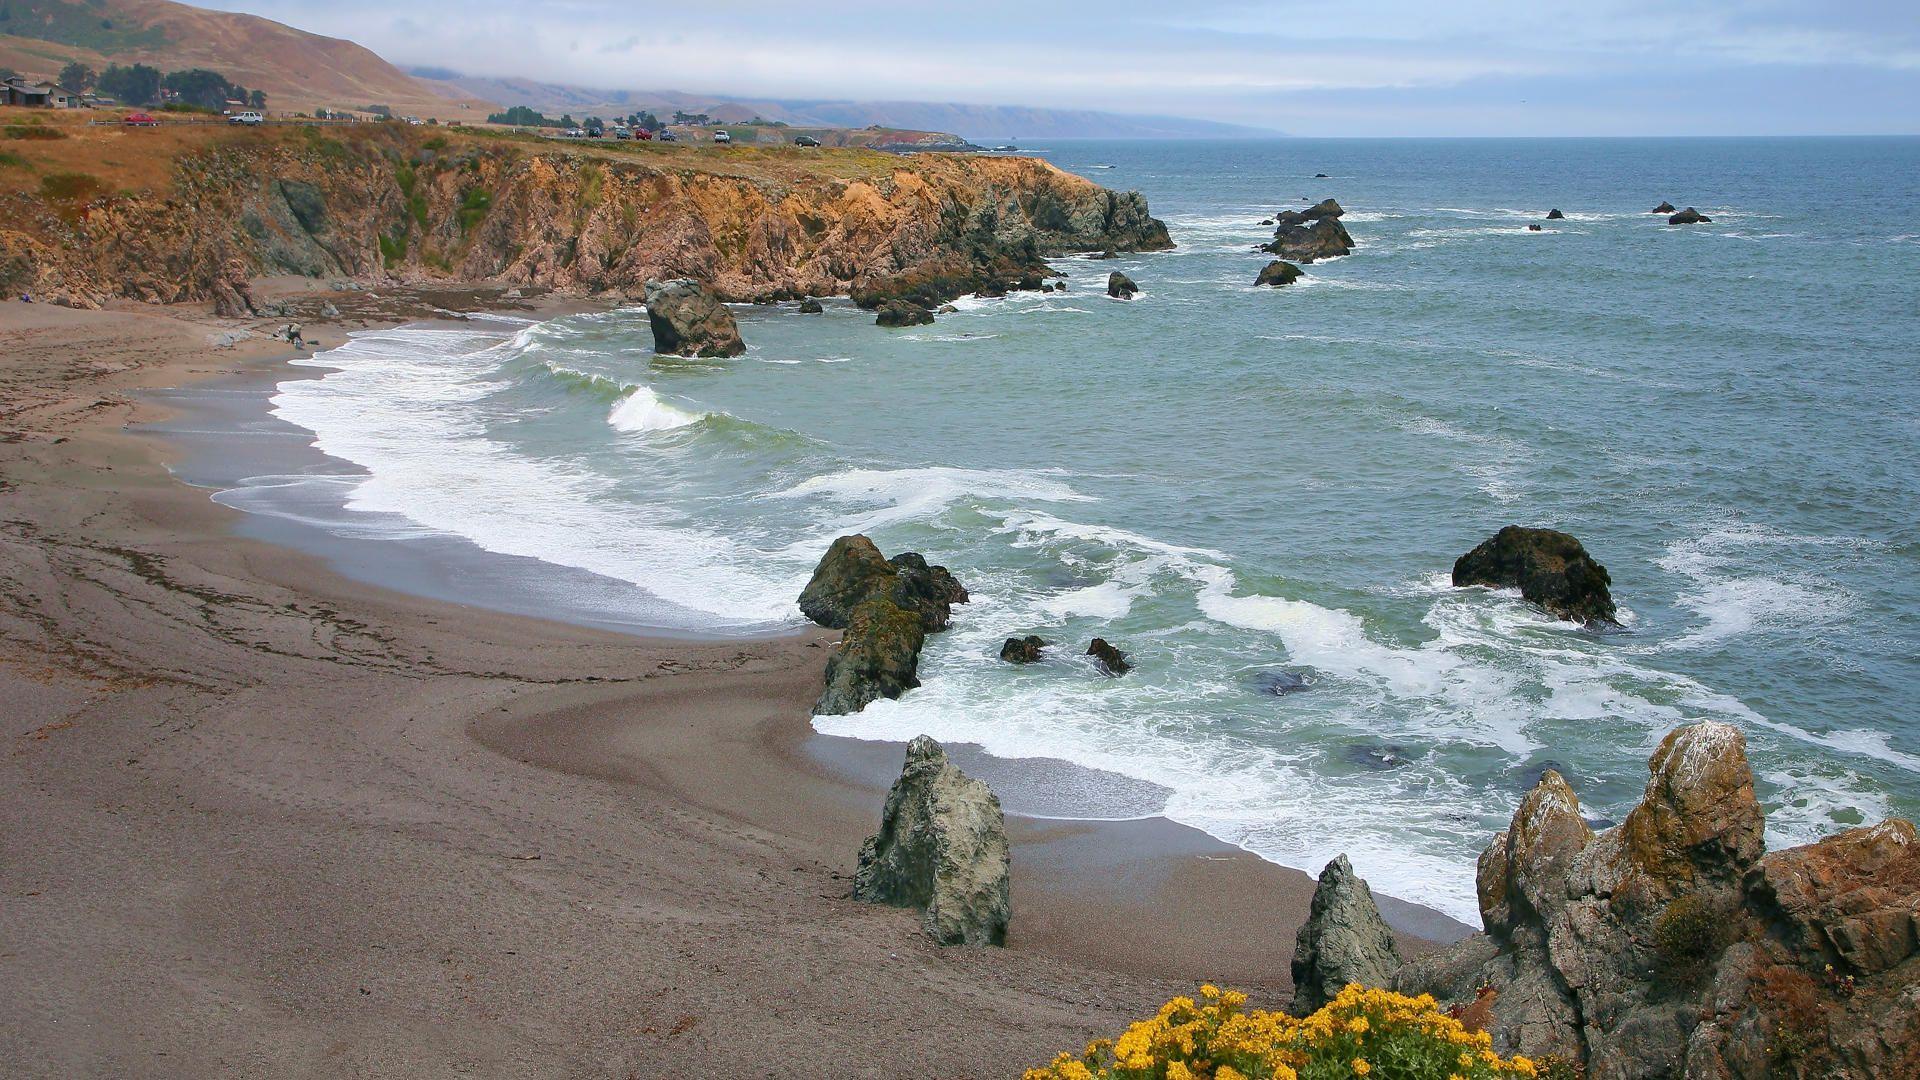 Schoolhouse Beach in California wallpaper 35950 1920x1080